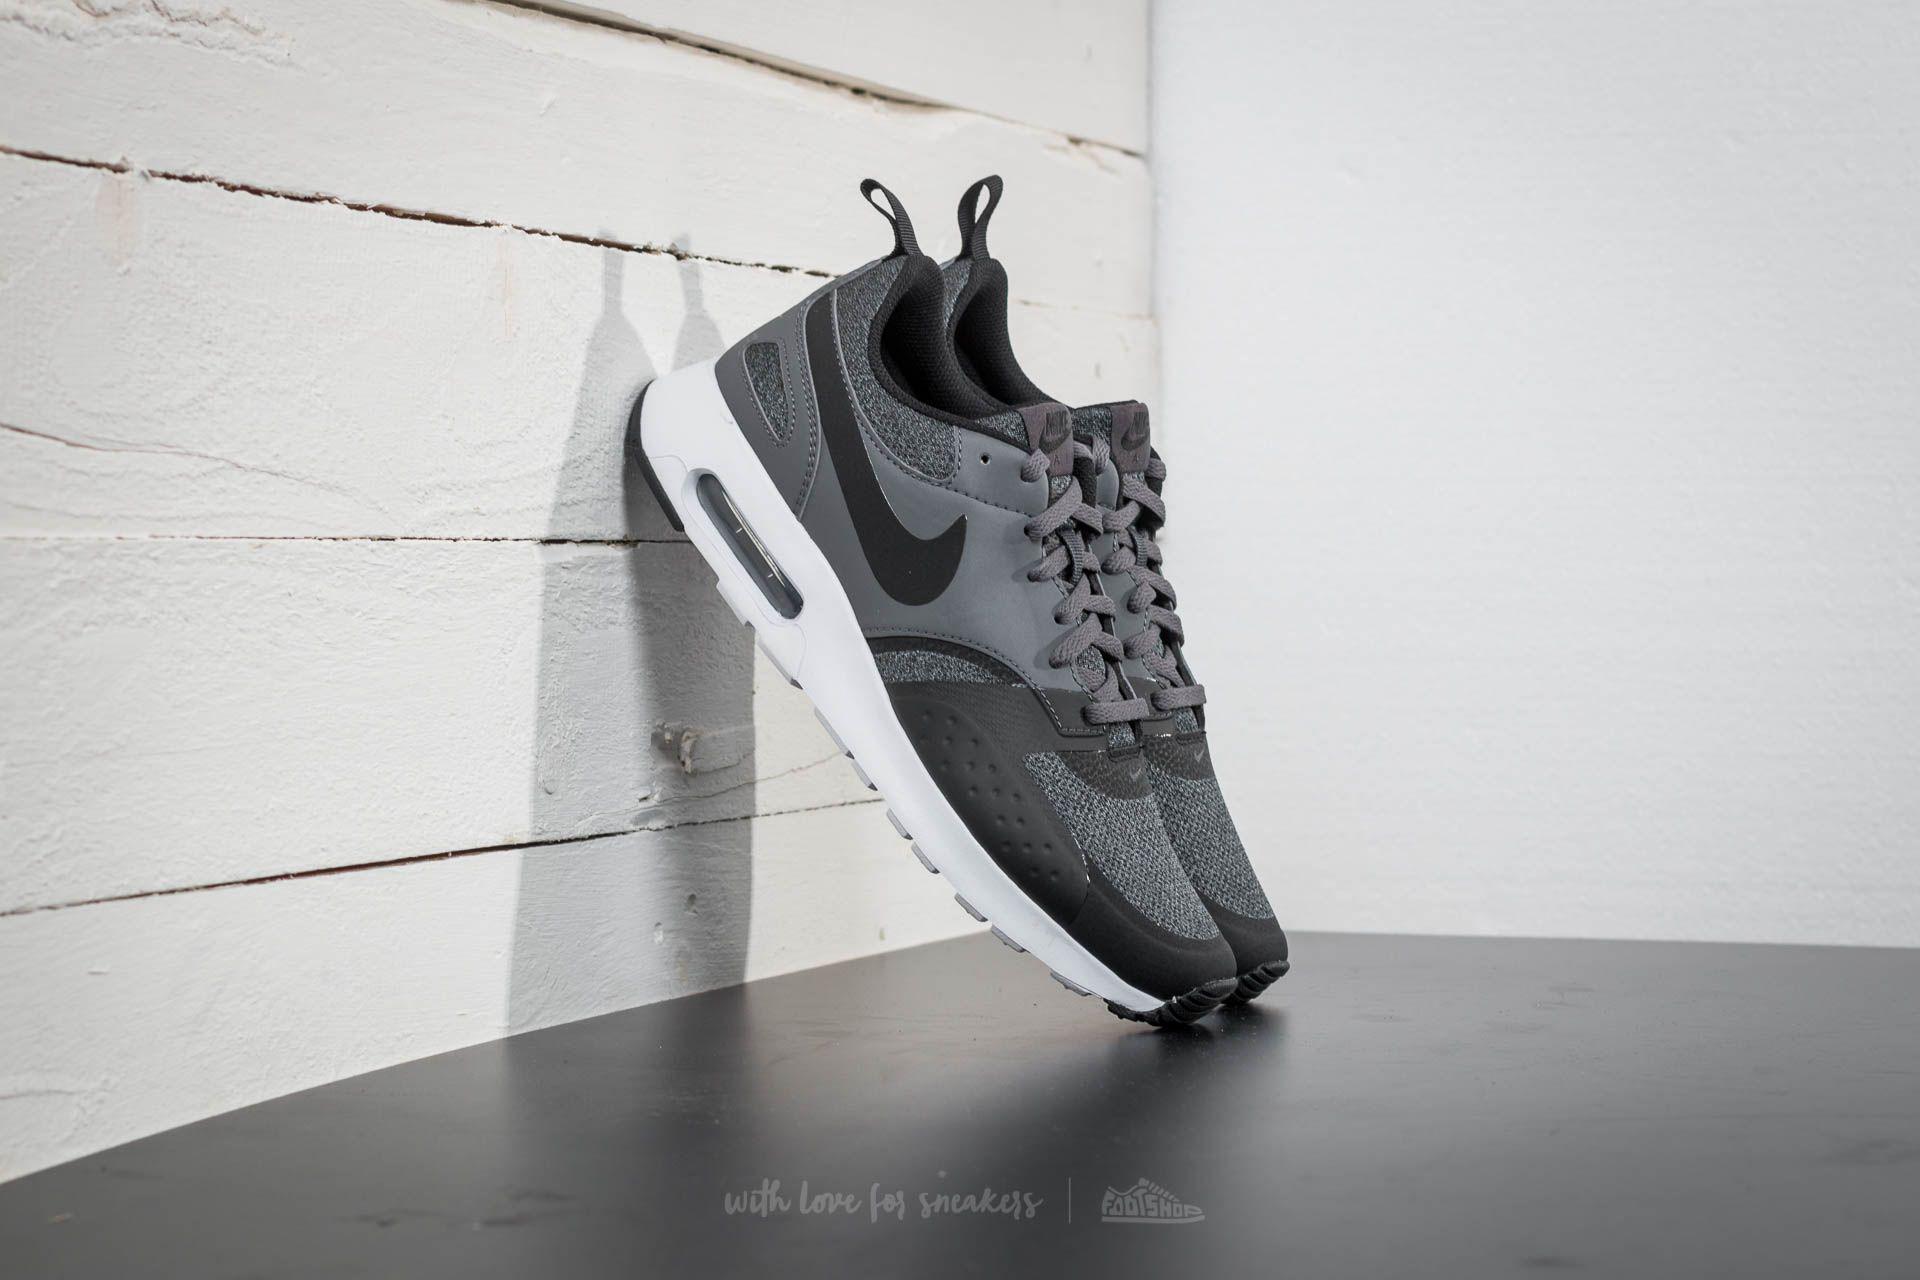 9905b9e59f1 Lyst - Nike Air Max Vision Se Anthracite  Black-dark Grey in Gray ...